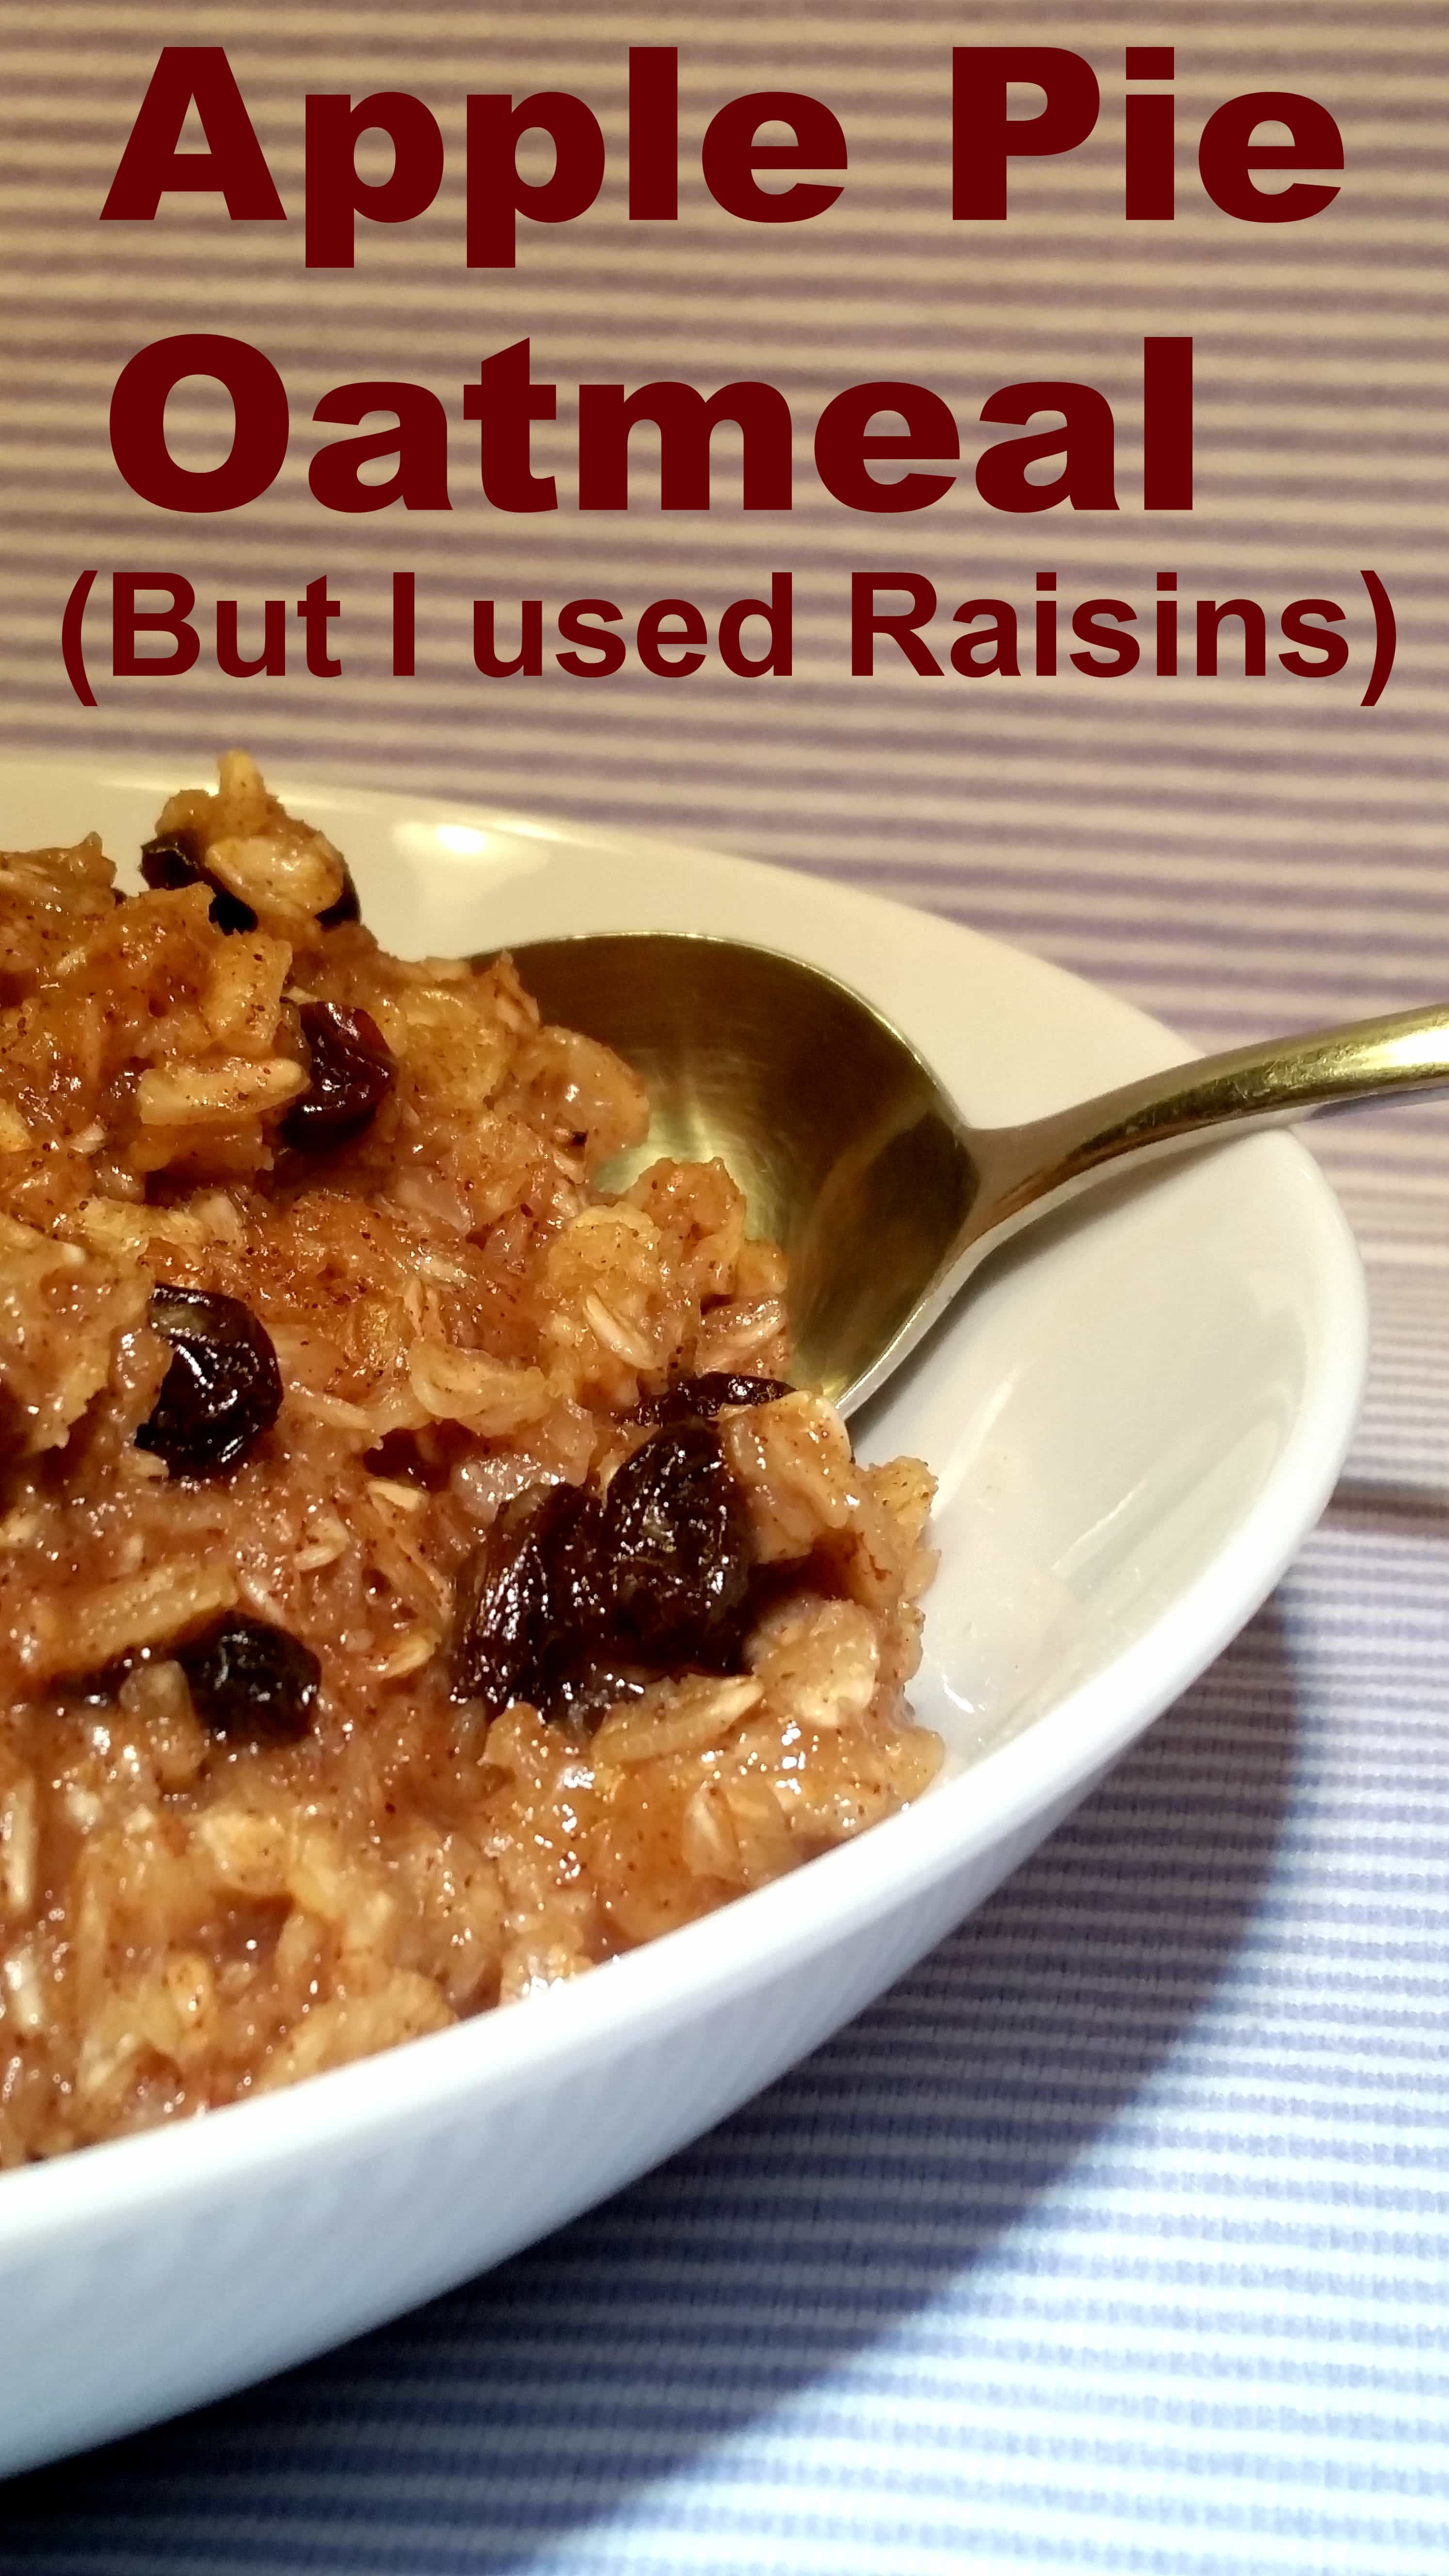 Easy Apple Pie Oatmeal (But I used Raisins)